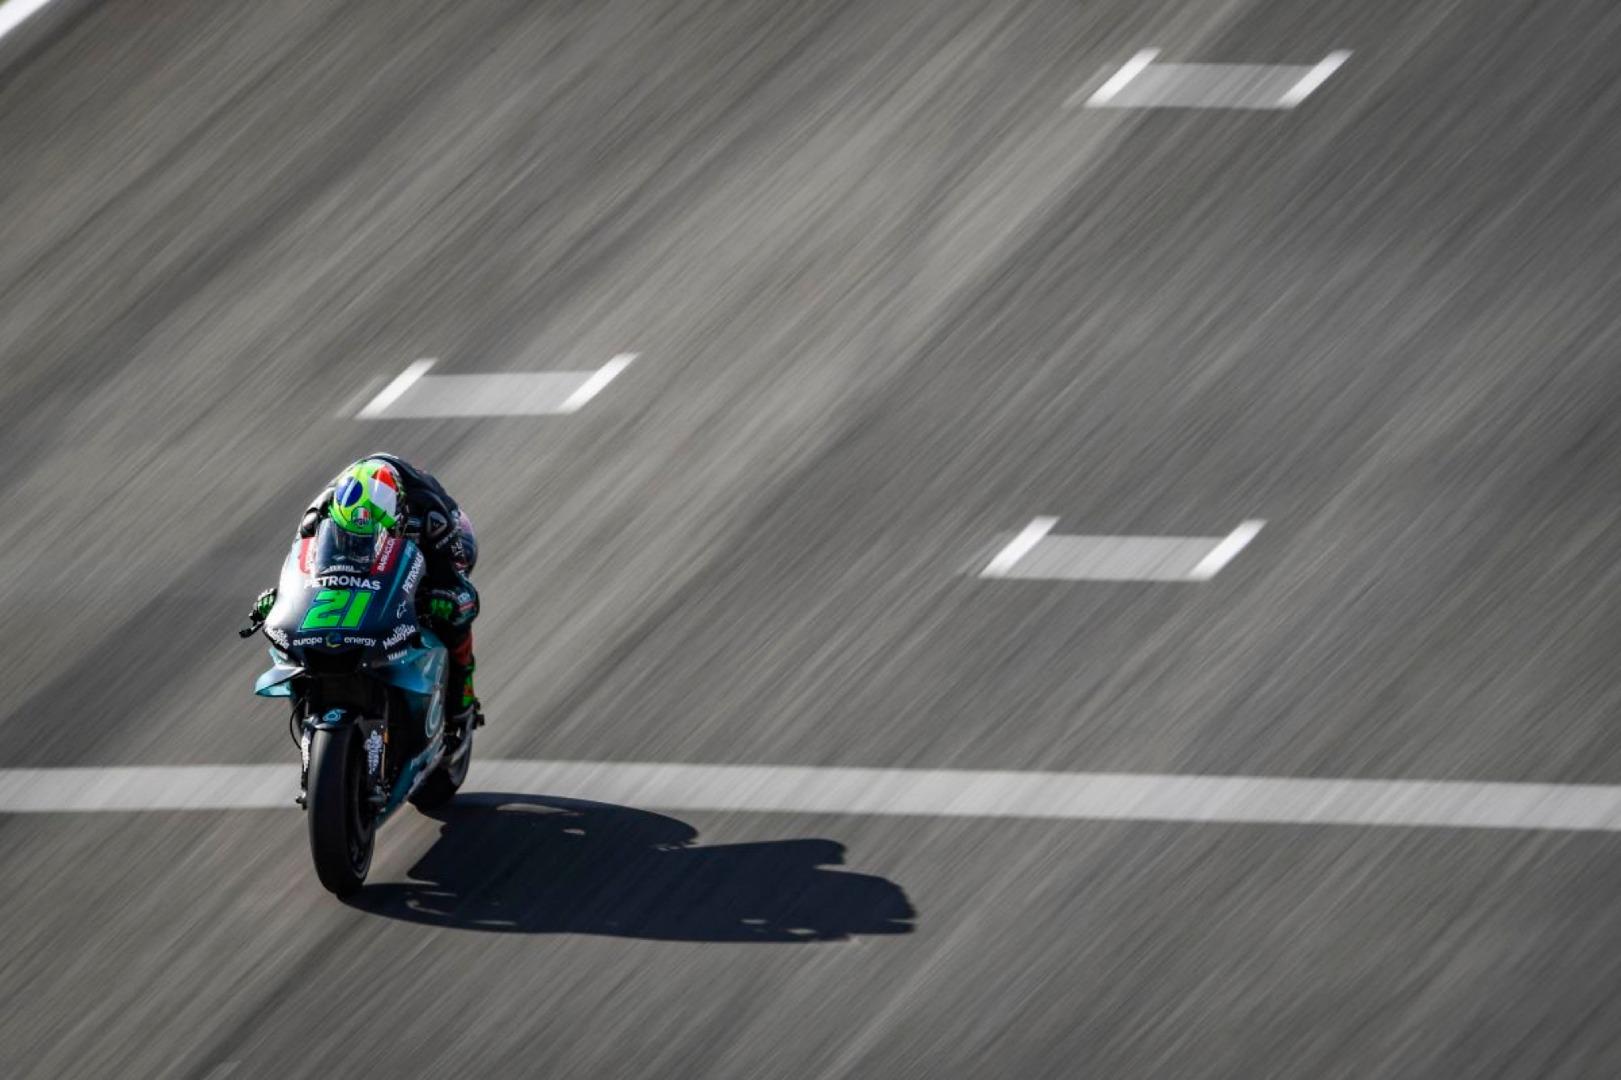 Franco Morbidelli en MotoGP 2019